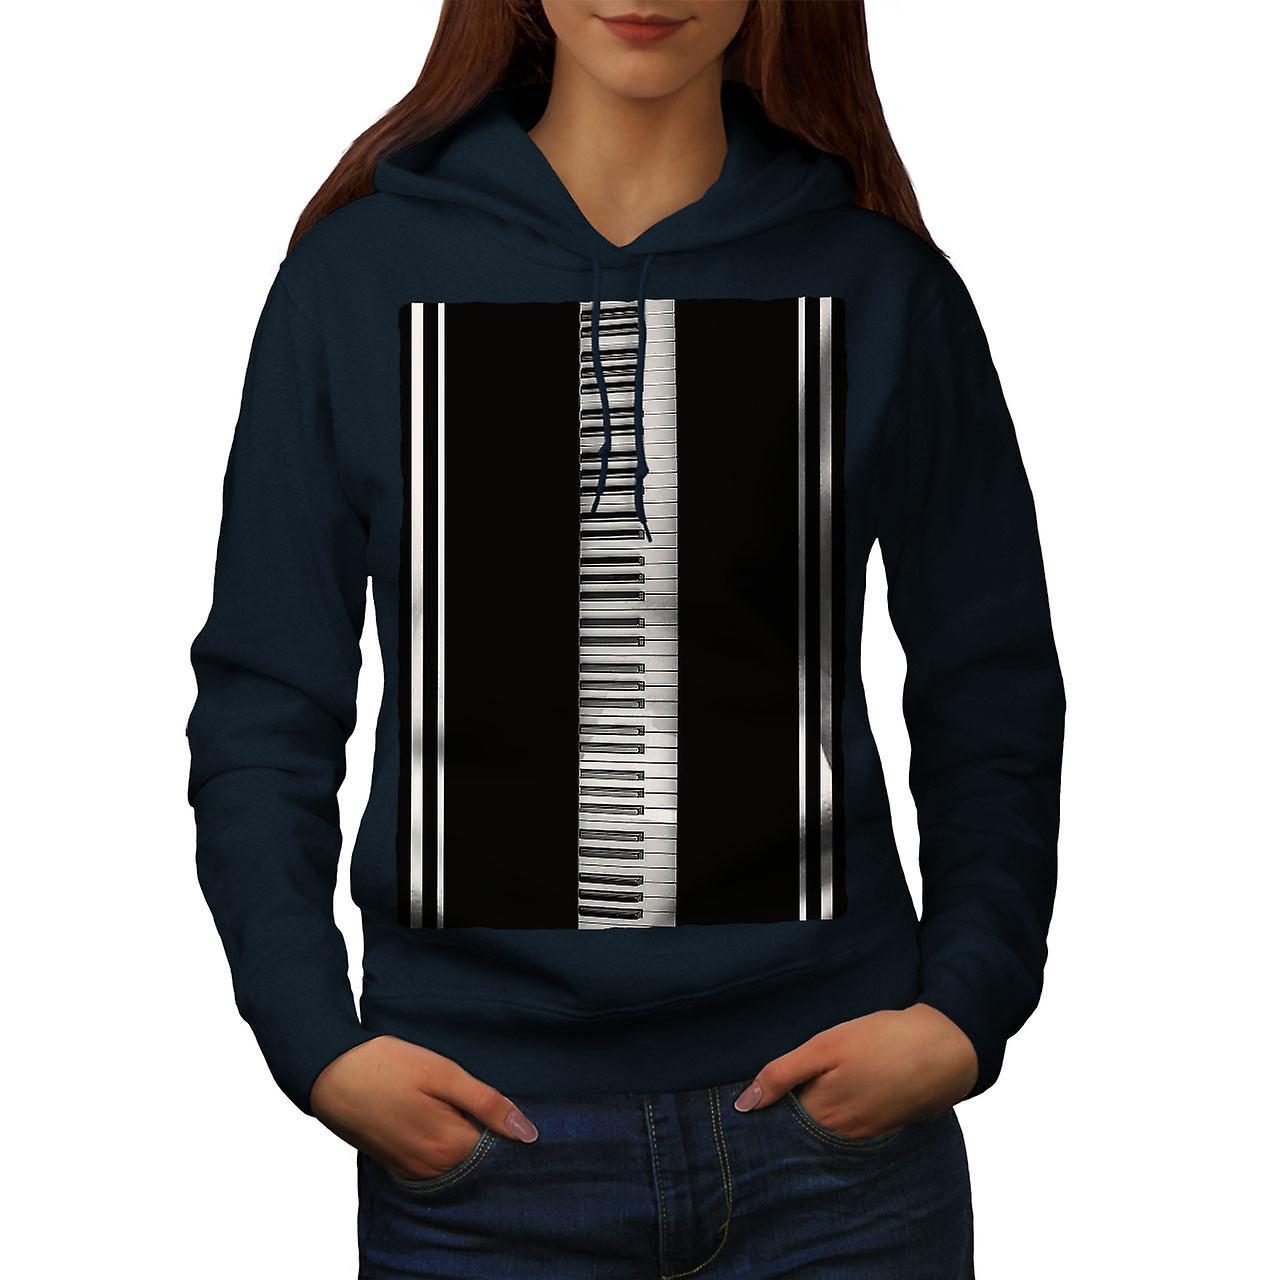 Touches du piano clavier NavyHoodie femmes